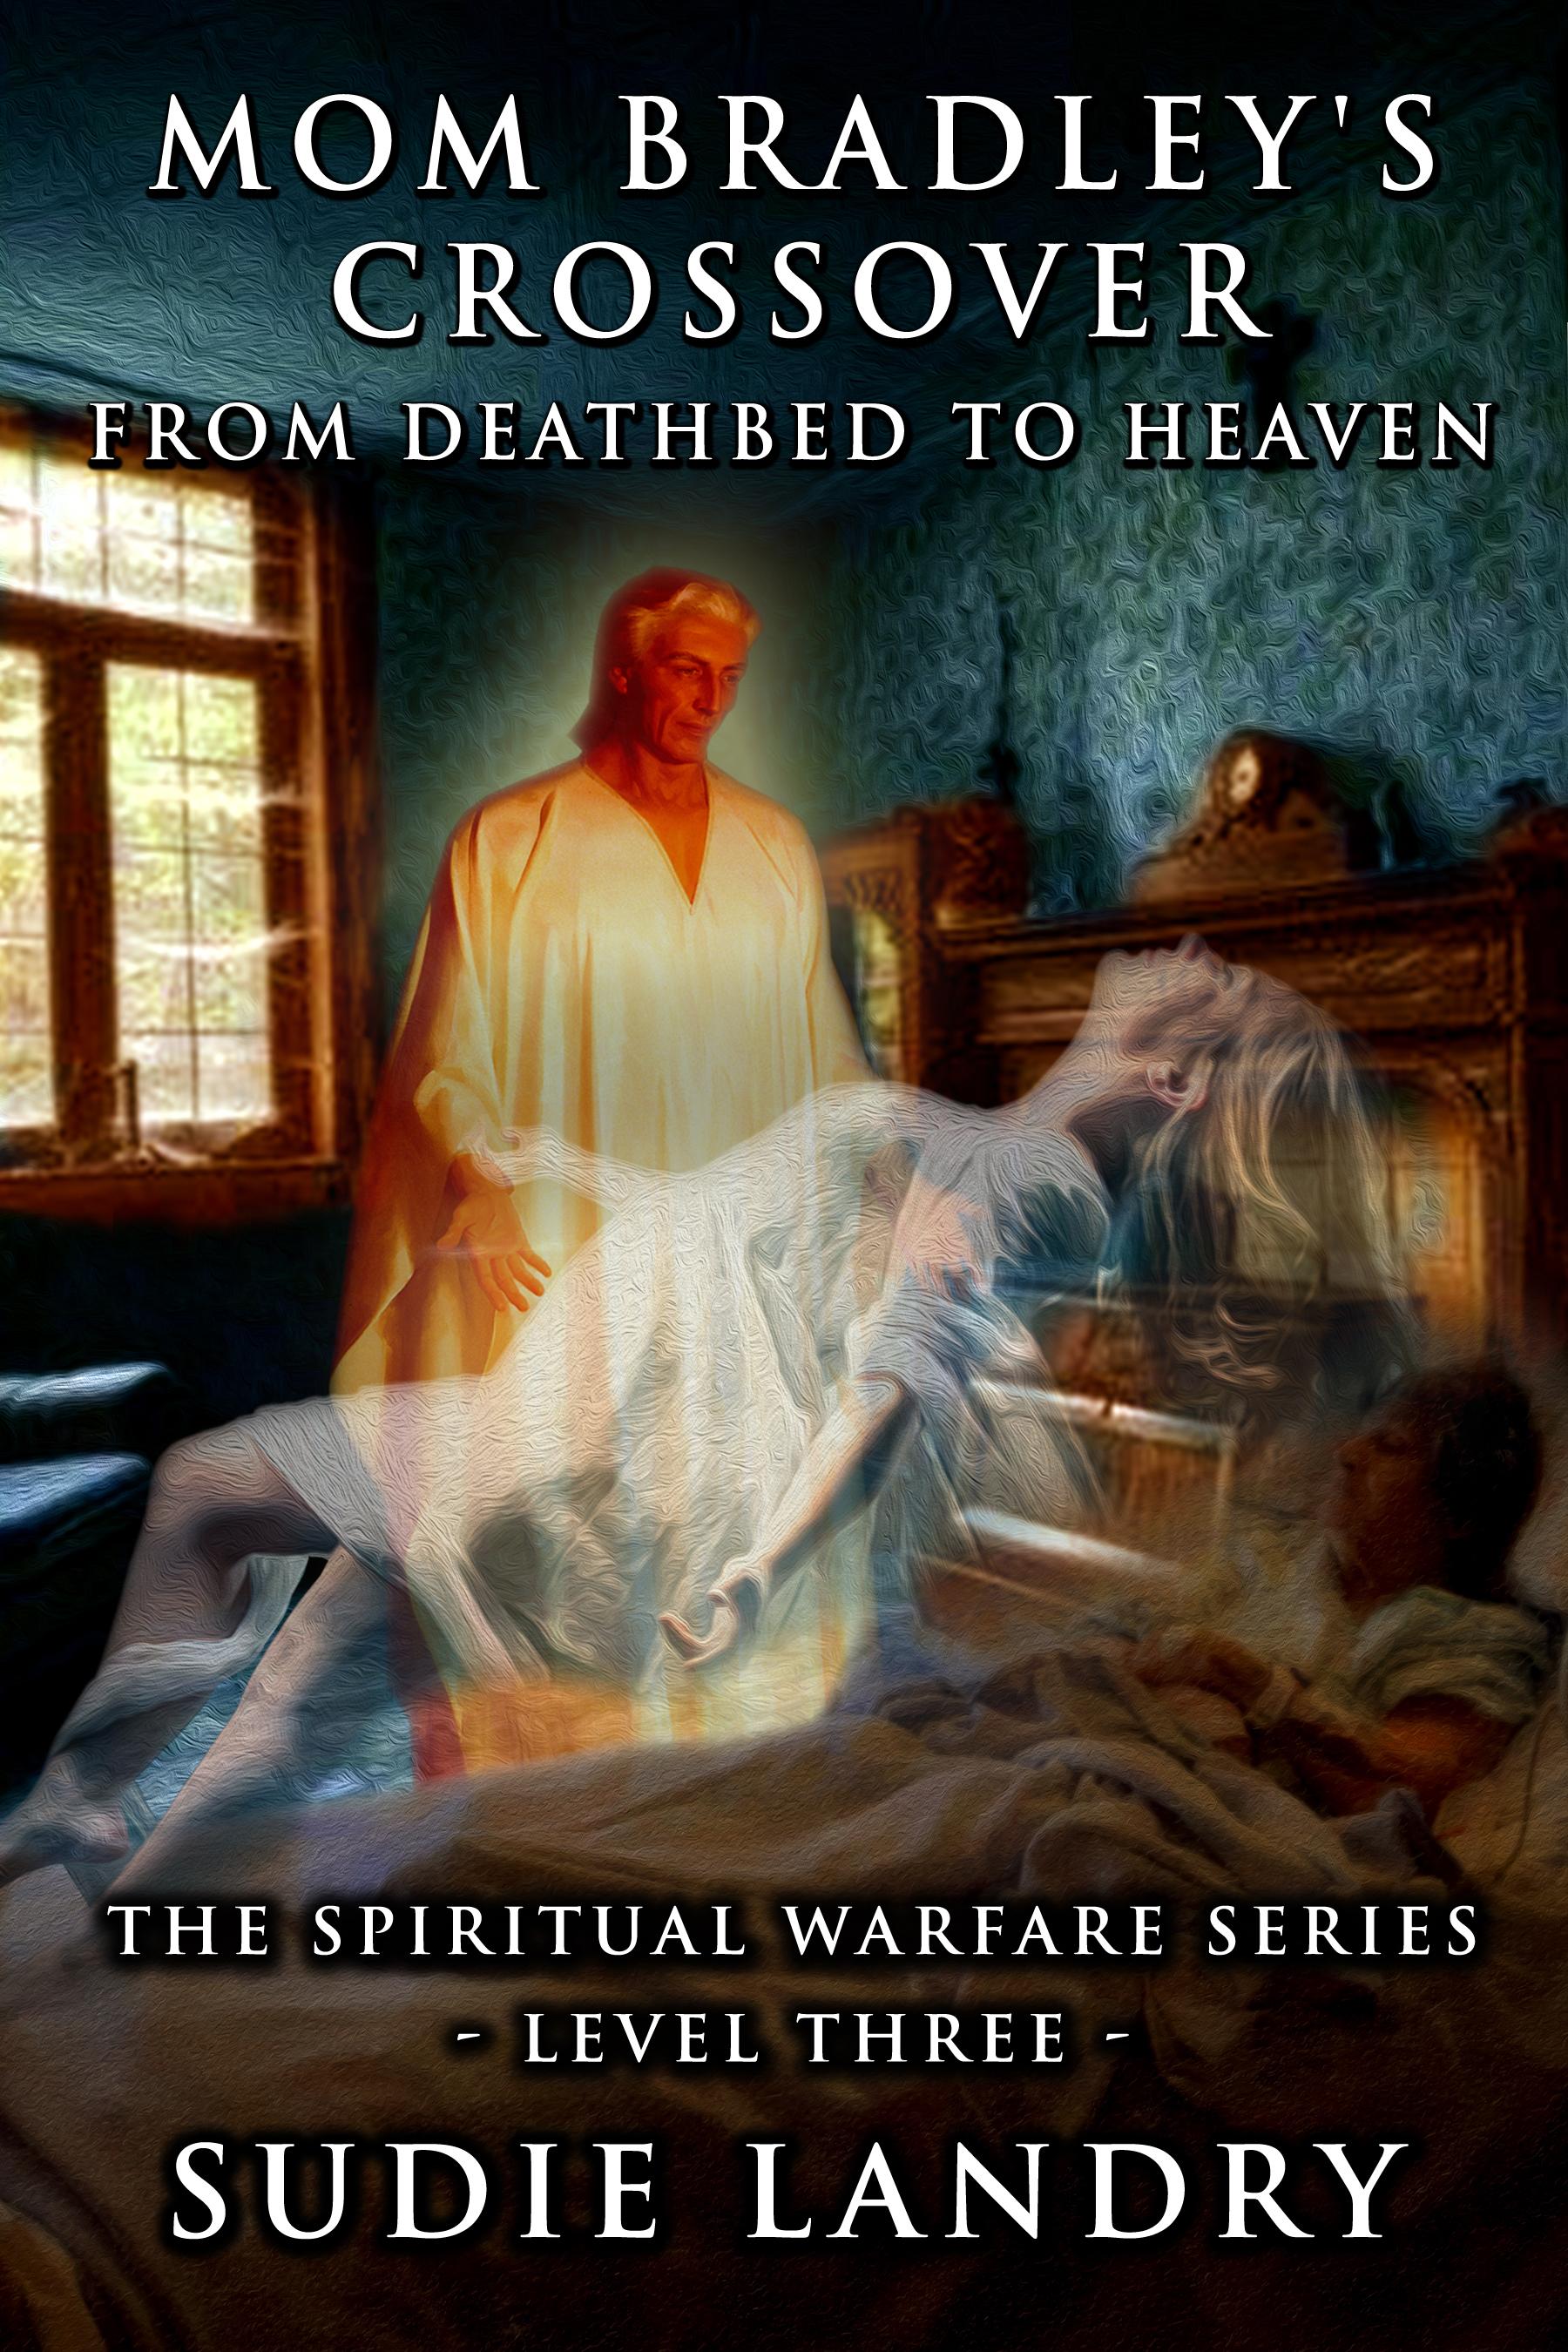 MOM-BRADLEY'S CROSSOVER (The Spiritual Warfare Series) (Volume 3)